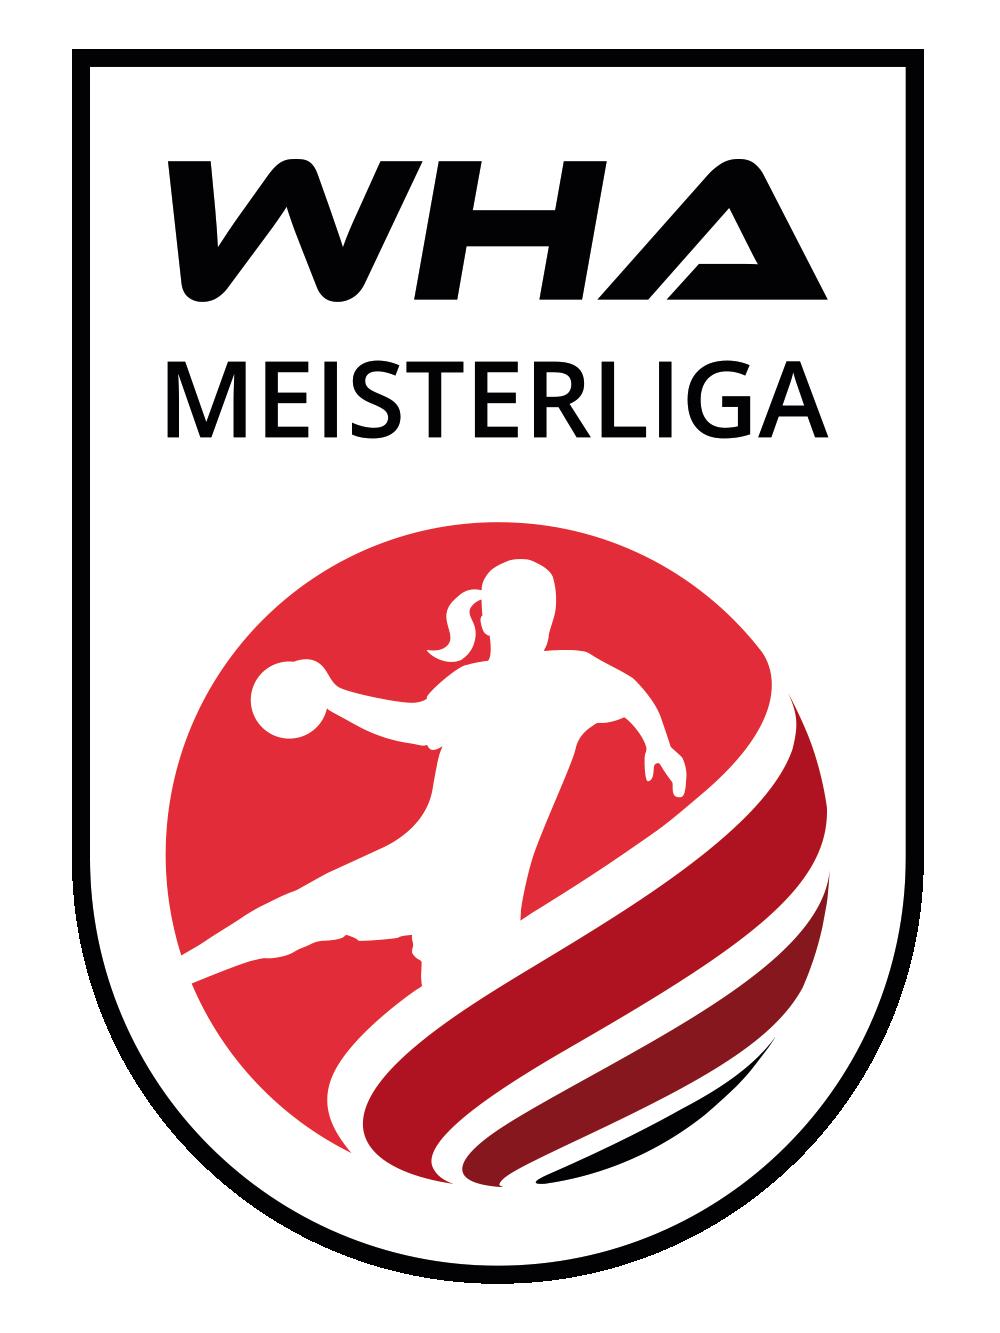 https://0501.nccdn.net/4_2/000/000/081/4ce/wha_meisterliga-logo_rgb.png